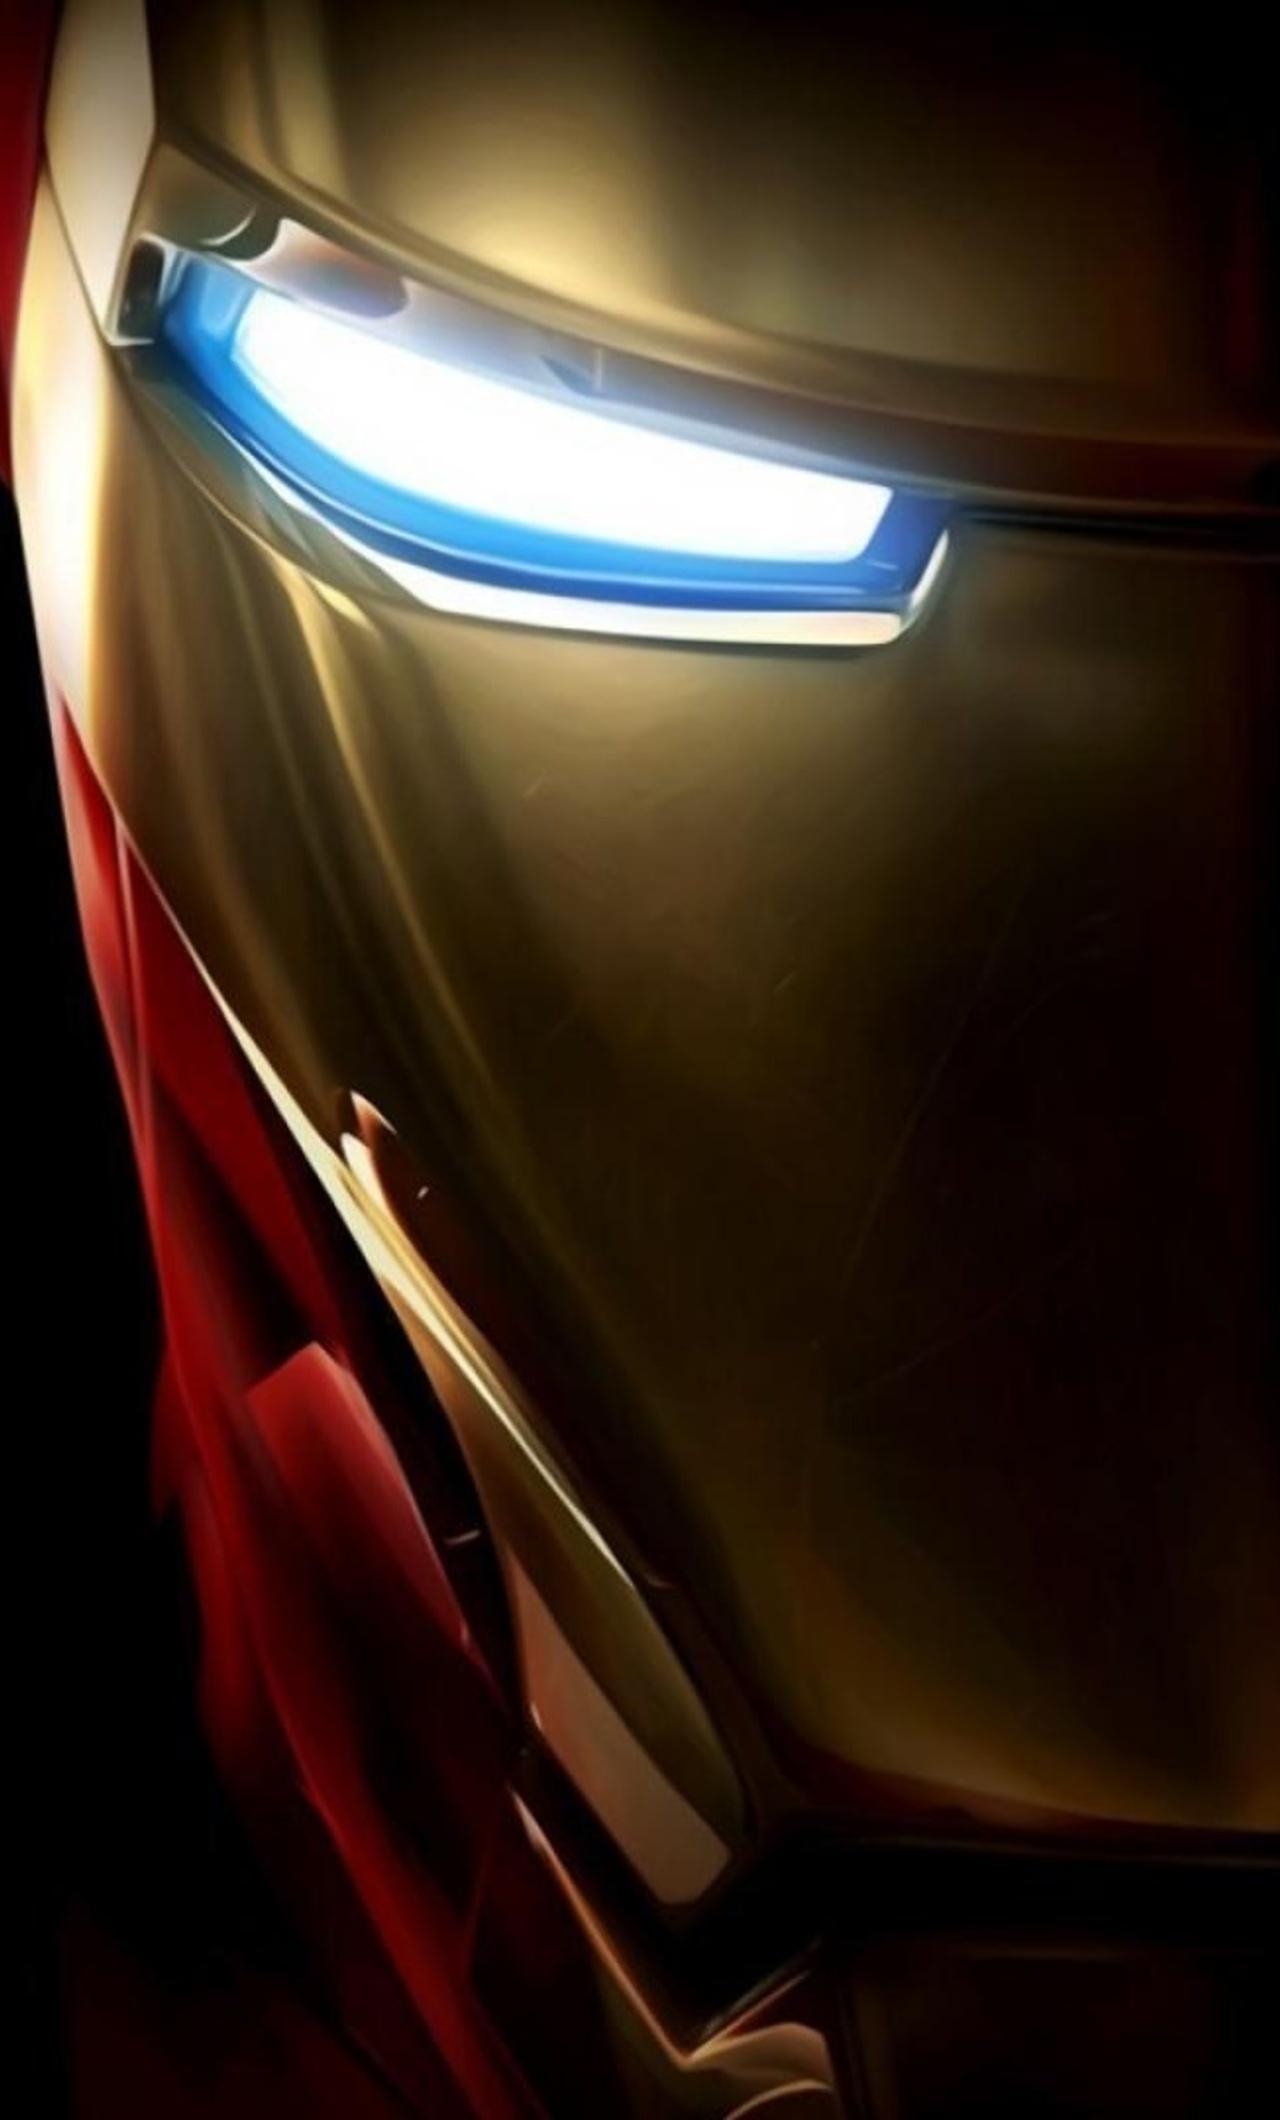 1280x2120 iron man helmet closeup iphone 6+ hd 4k wallpapers, images